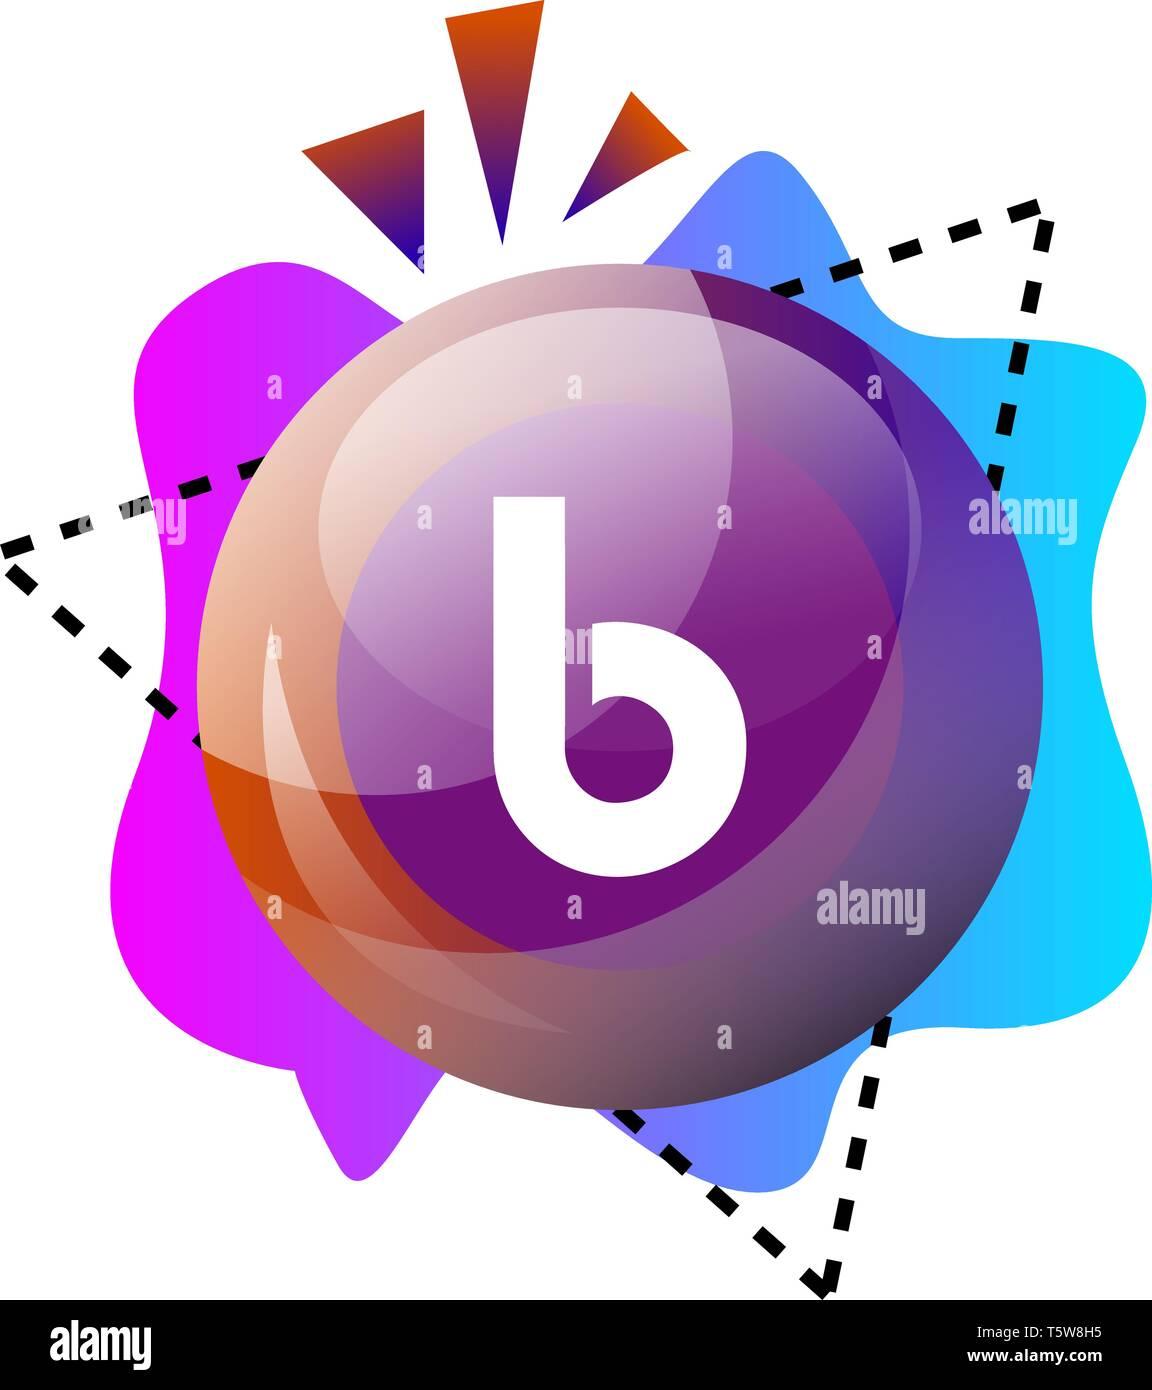 Yahoo Buzz Stock Photos & Yahoo Buzz Stock Images - Alamy